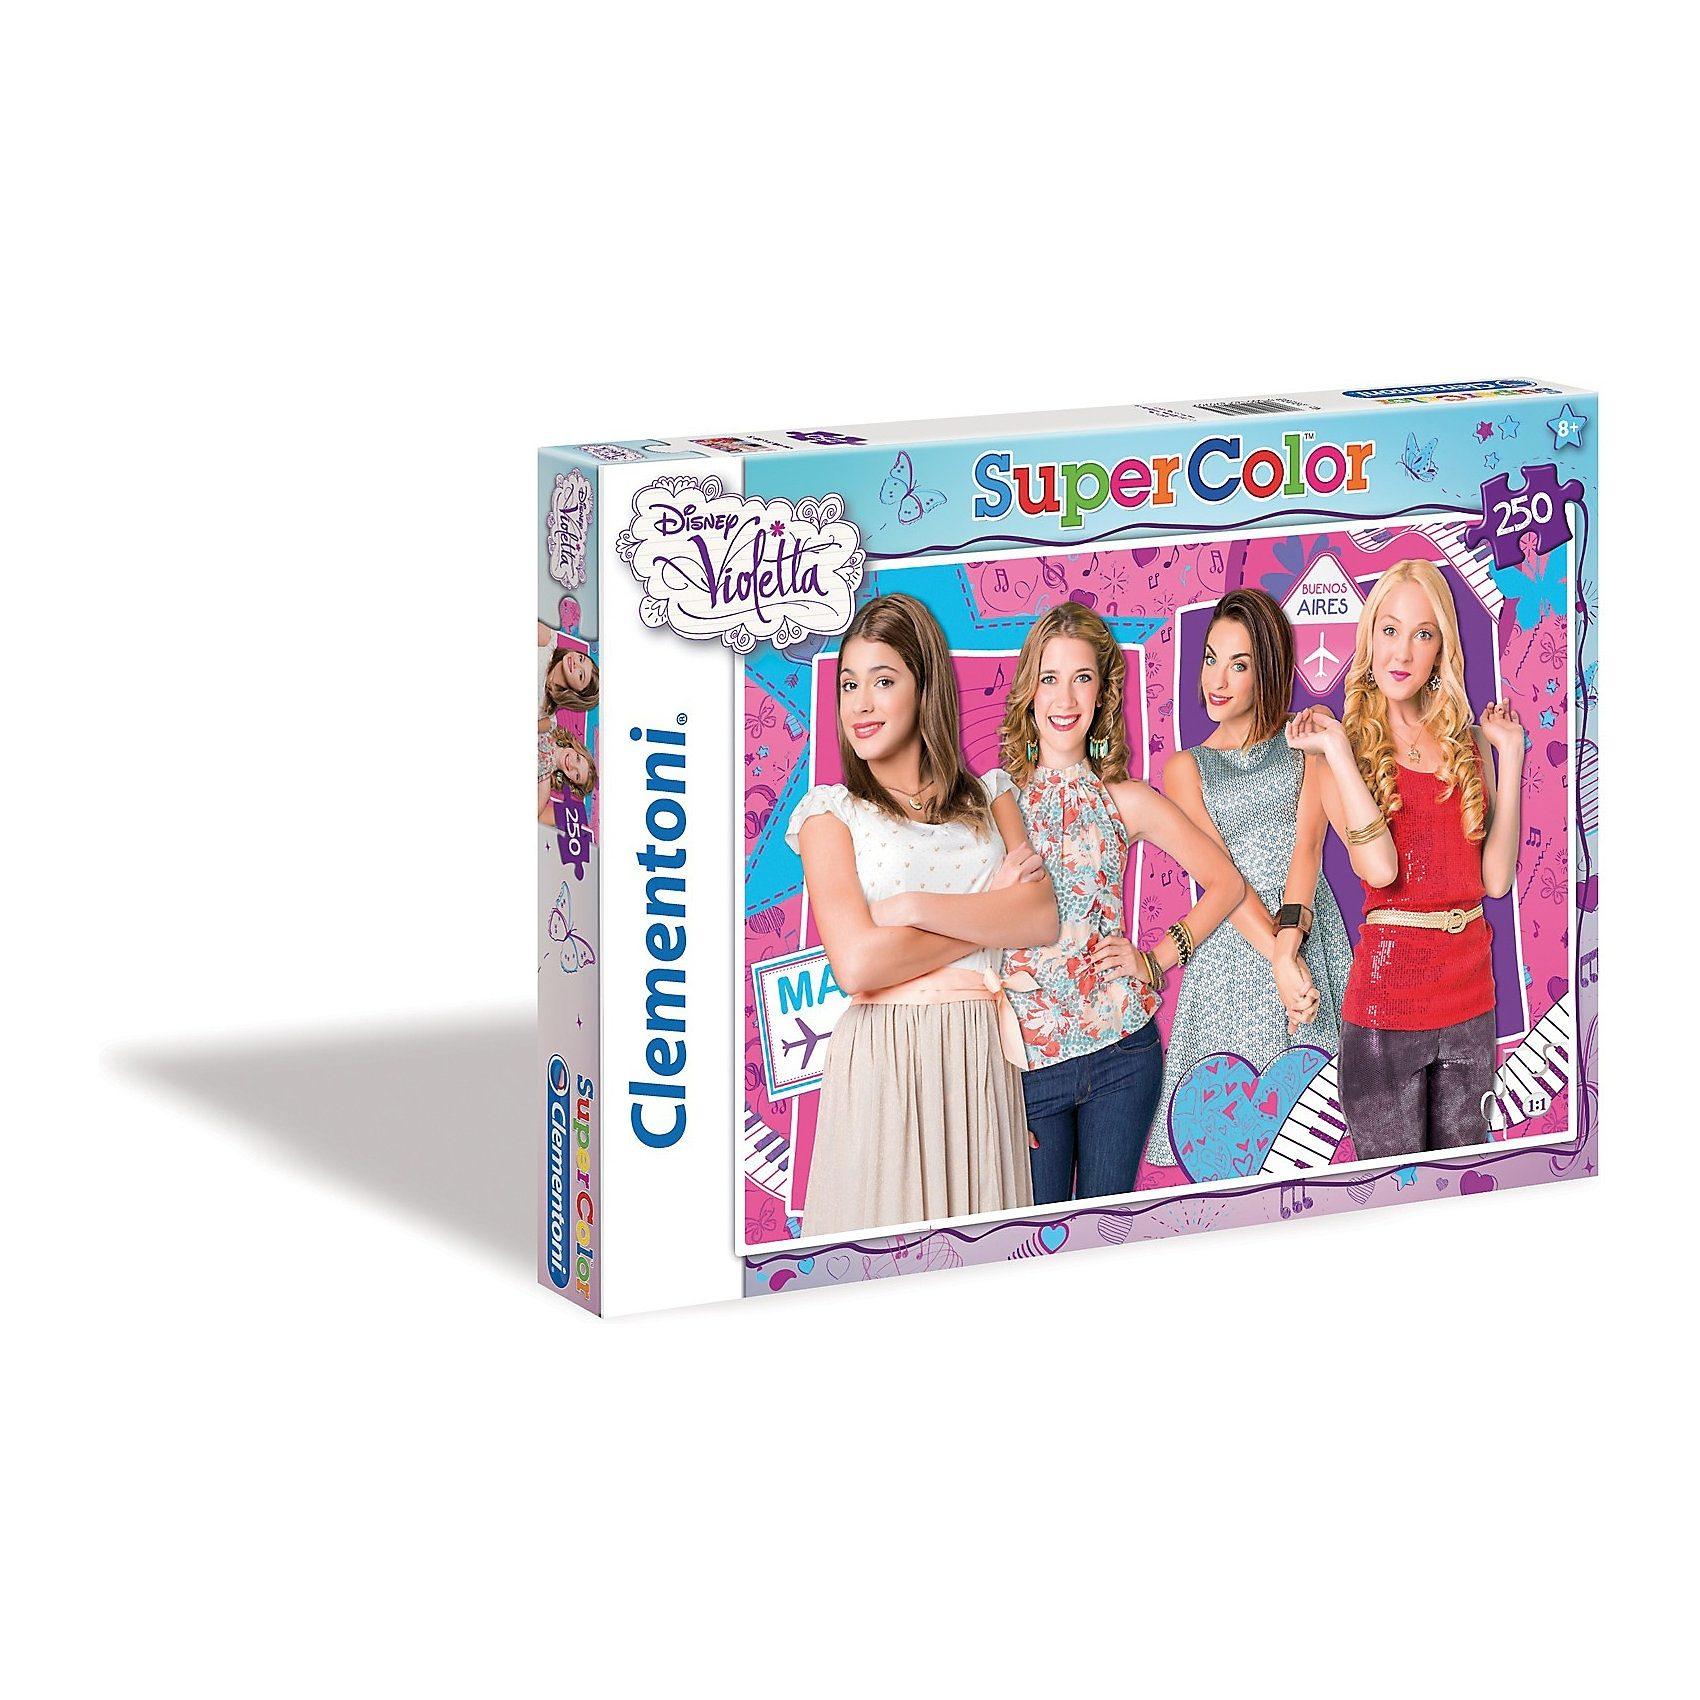 Clementoni Puzzle - 250 Teile - Violetta